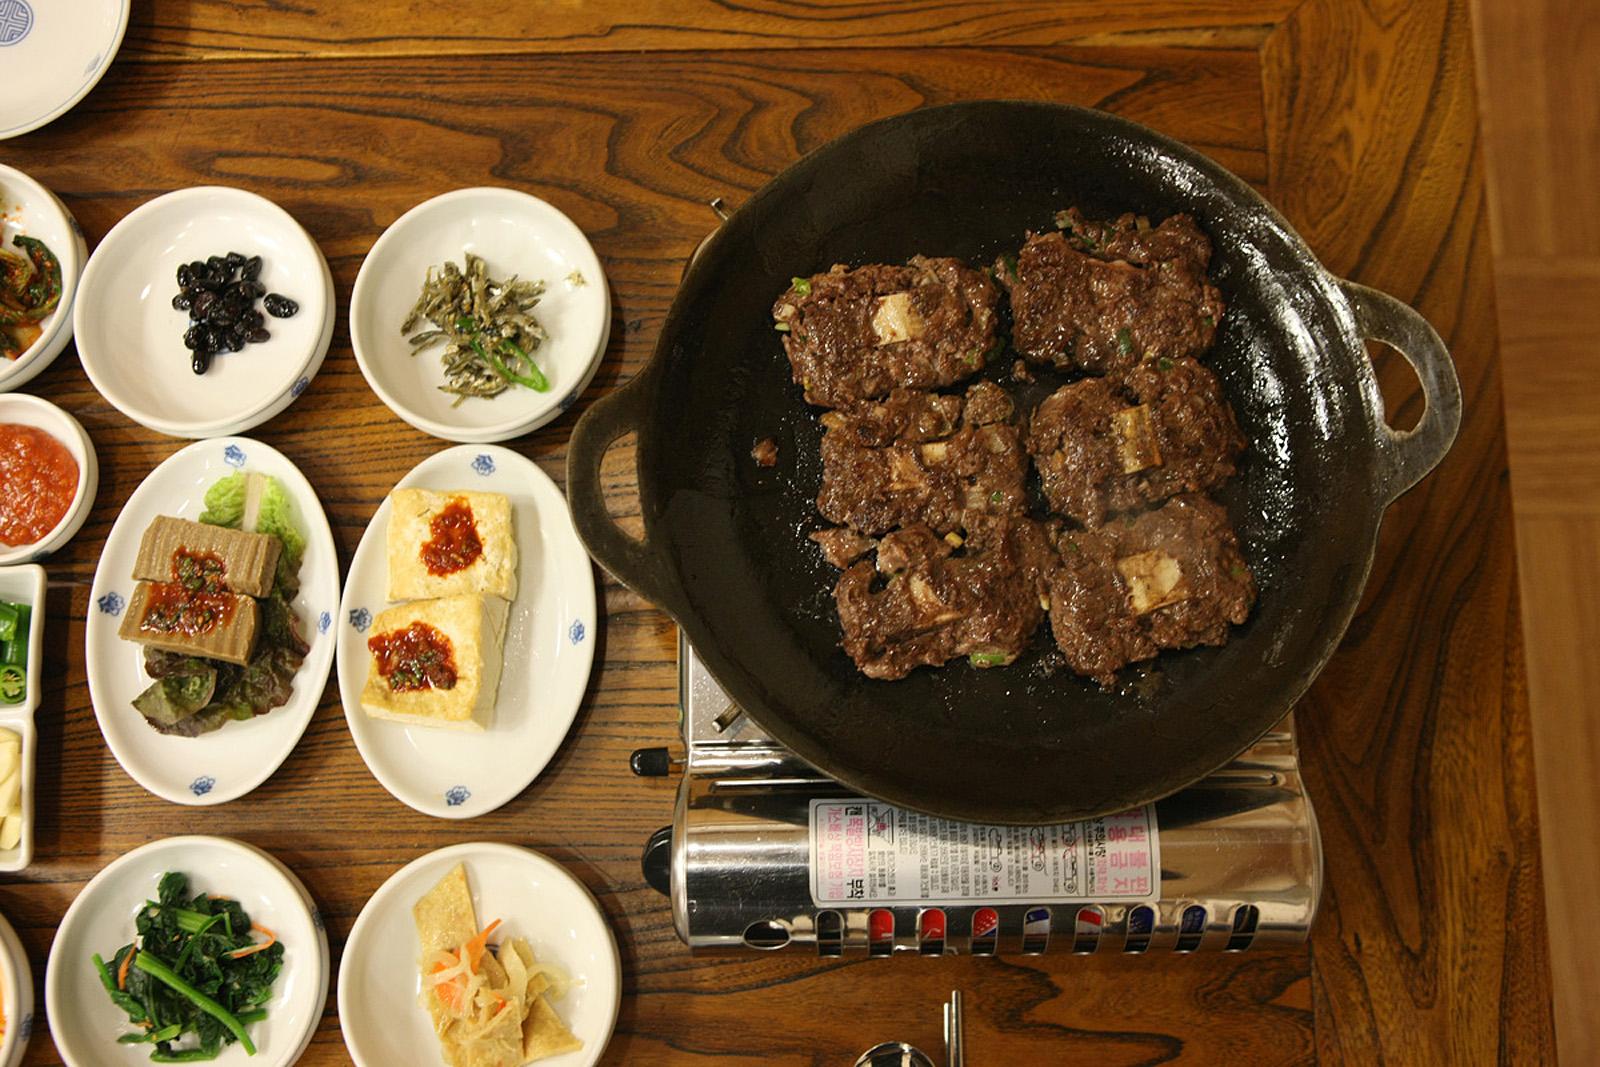 50 reasons Seoul is world\'s greatest city | CNN Travel